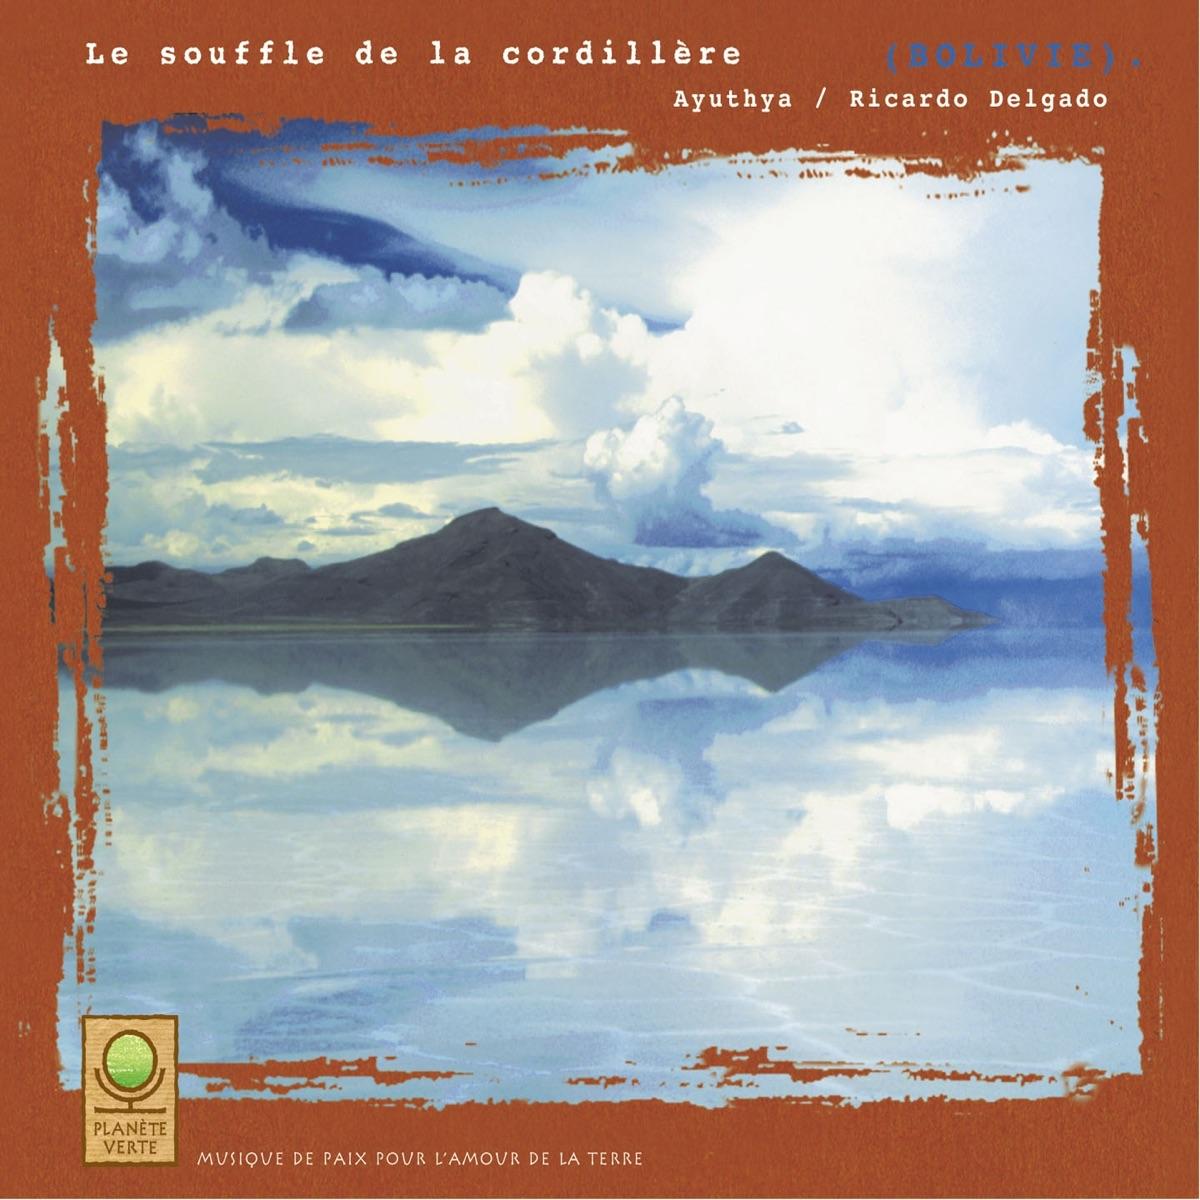 Planète verte Le souffle de la Cordillère Bolivie Ayuthya  Ricardo Delgado CD cover